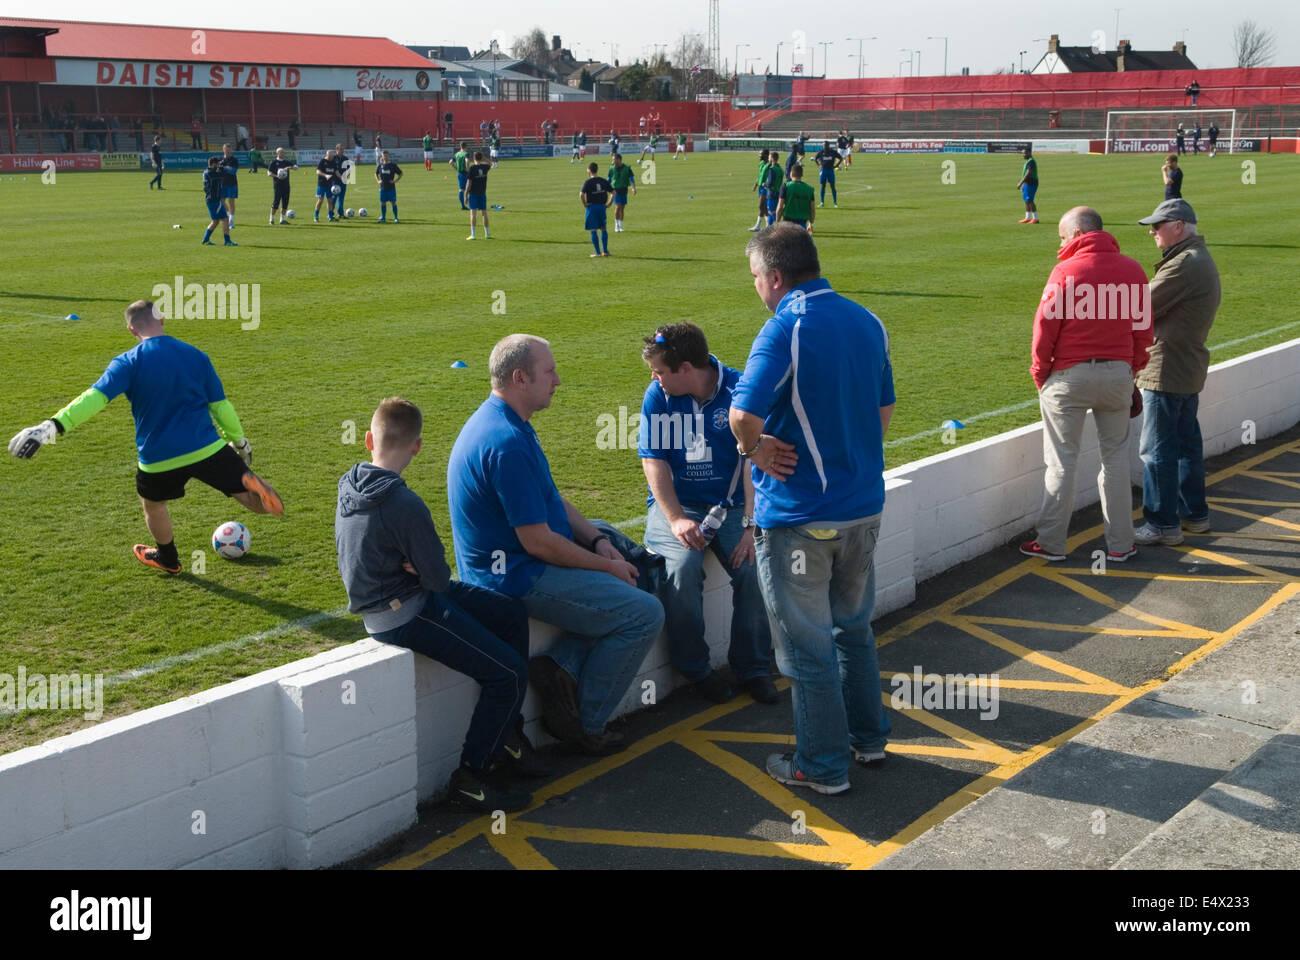 Kicking around before the start of a football game. Ebbsfleet v Tunbridge. Ebbsfleet Valley Kent UK.  HOMER SYKES - Stock Image